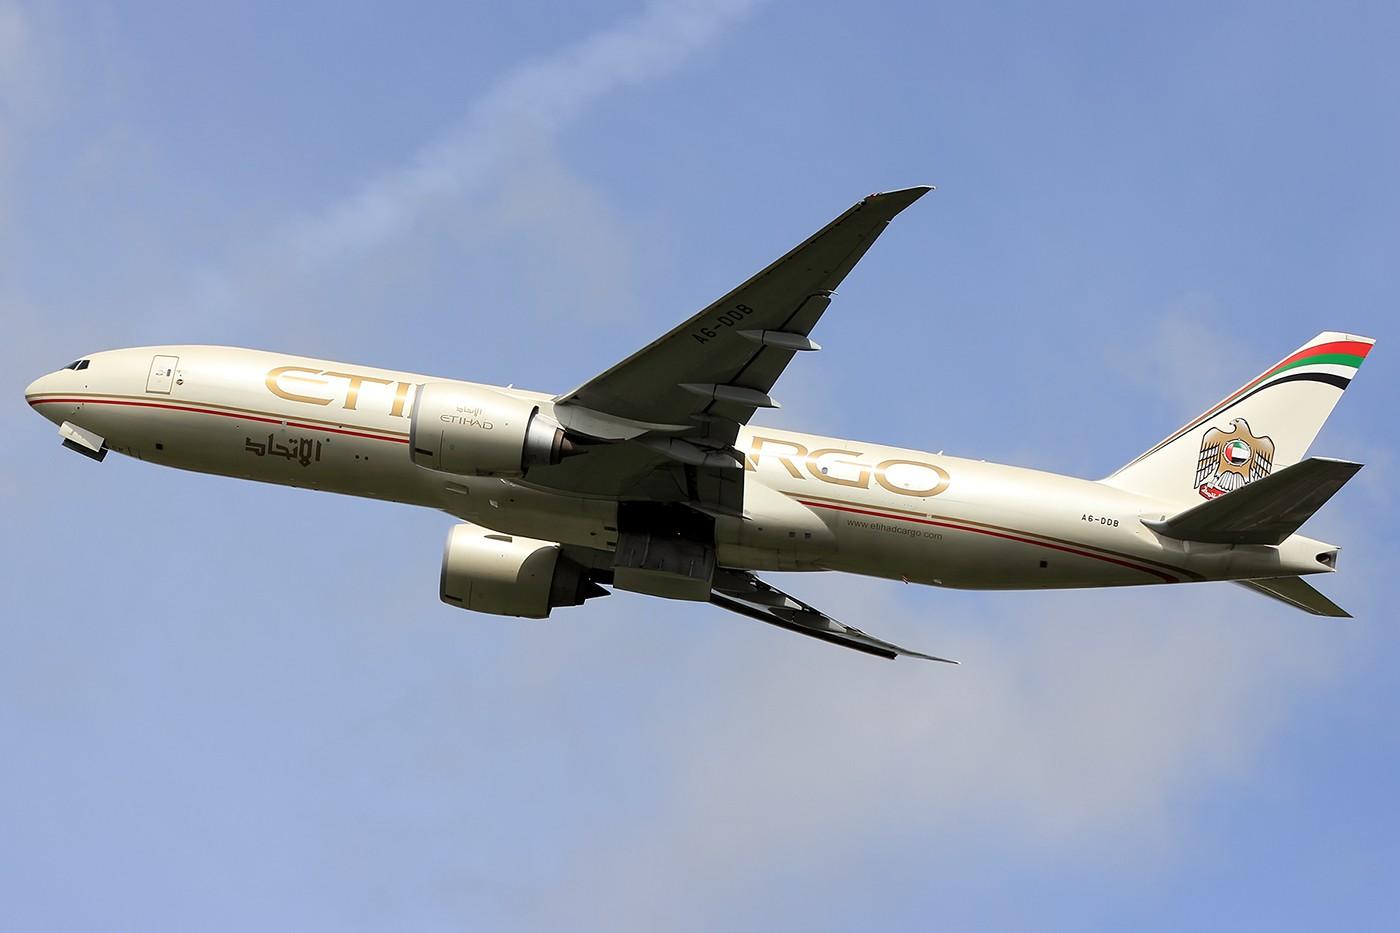 Re:[原创]【AMS】阿姆斯特丹常规卡狗一组 1400*933 BOEING 777-200 A6-DDB 荷兰阿姆斯特丹史基浦机场